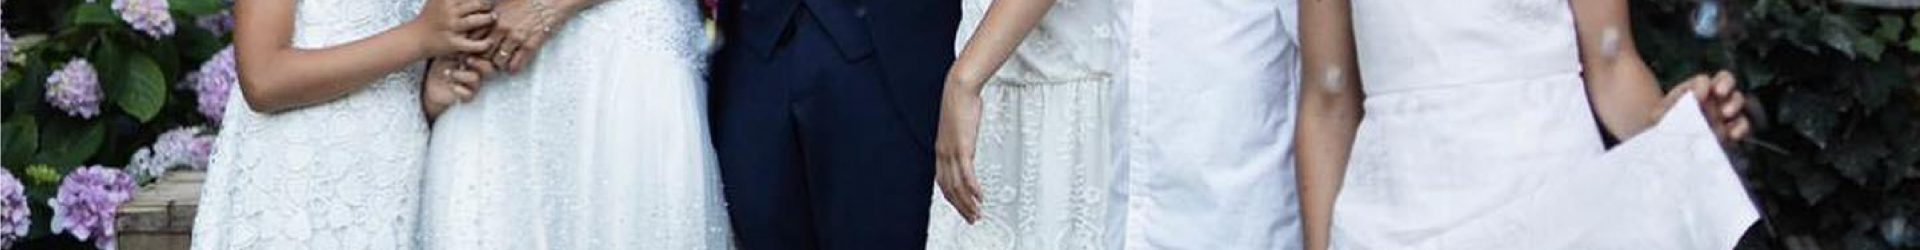 Jessica e Lorenzo matrimonio